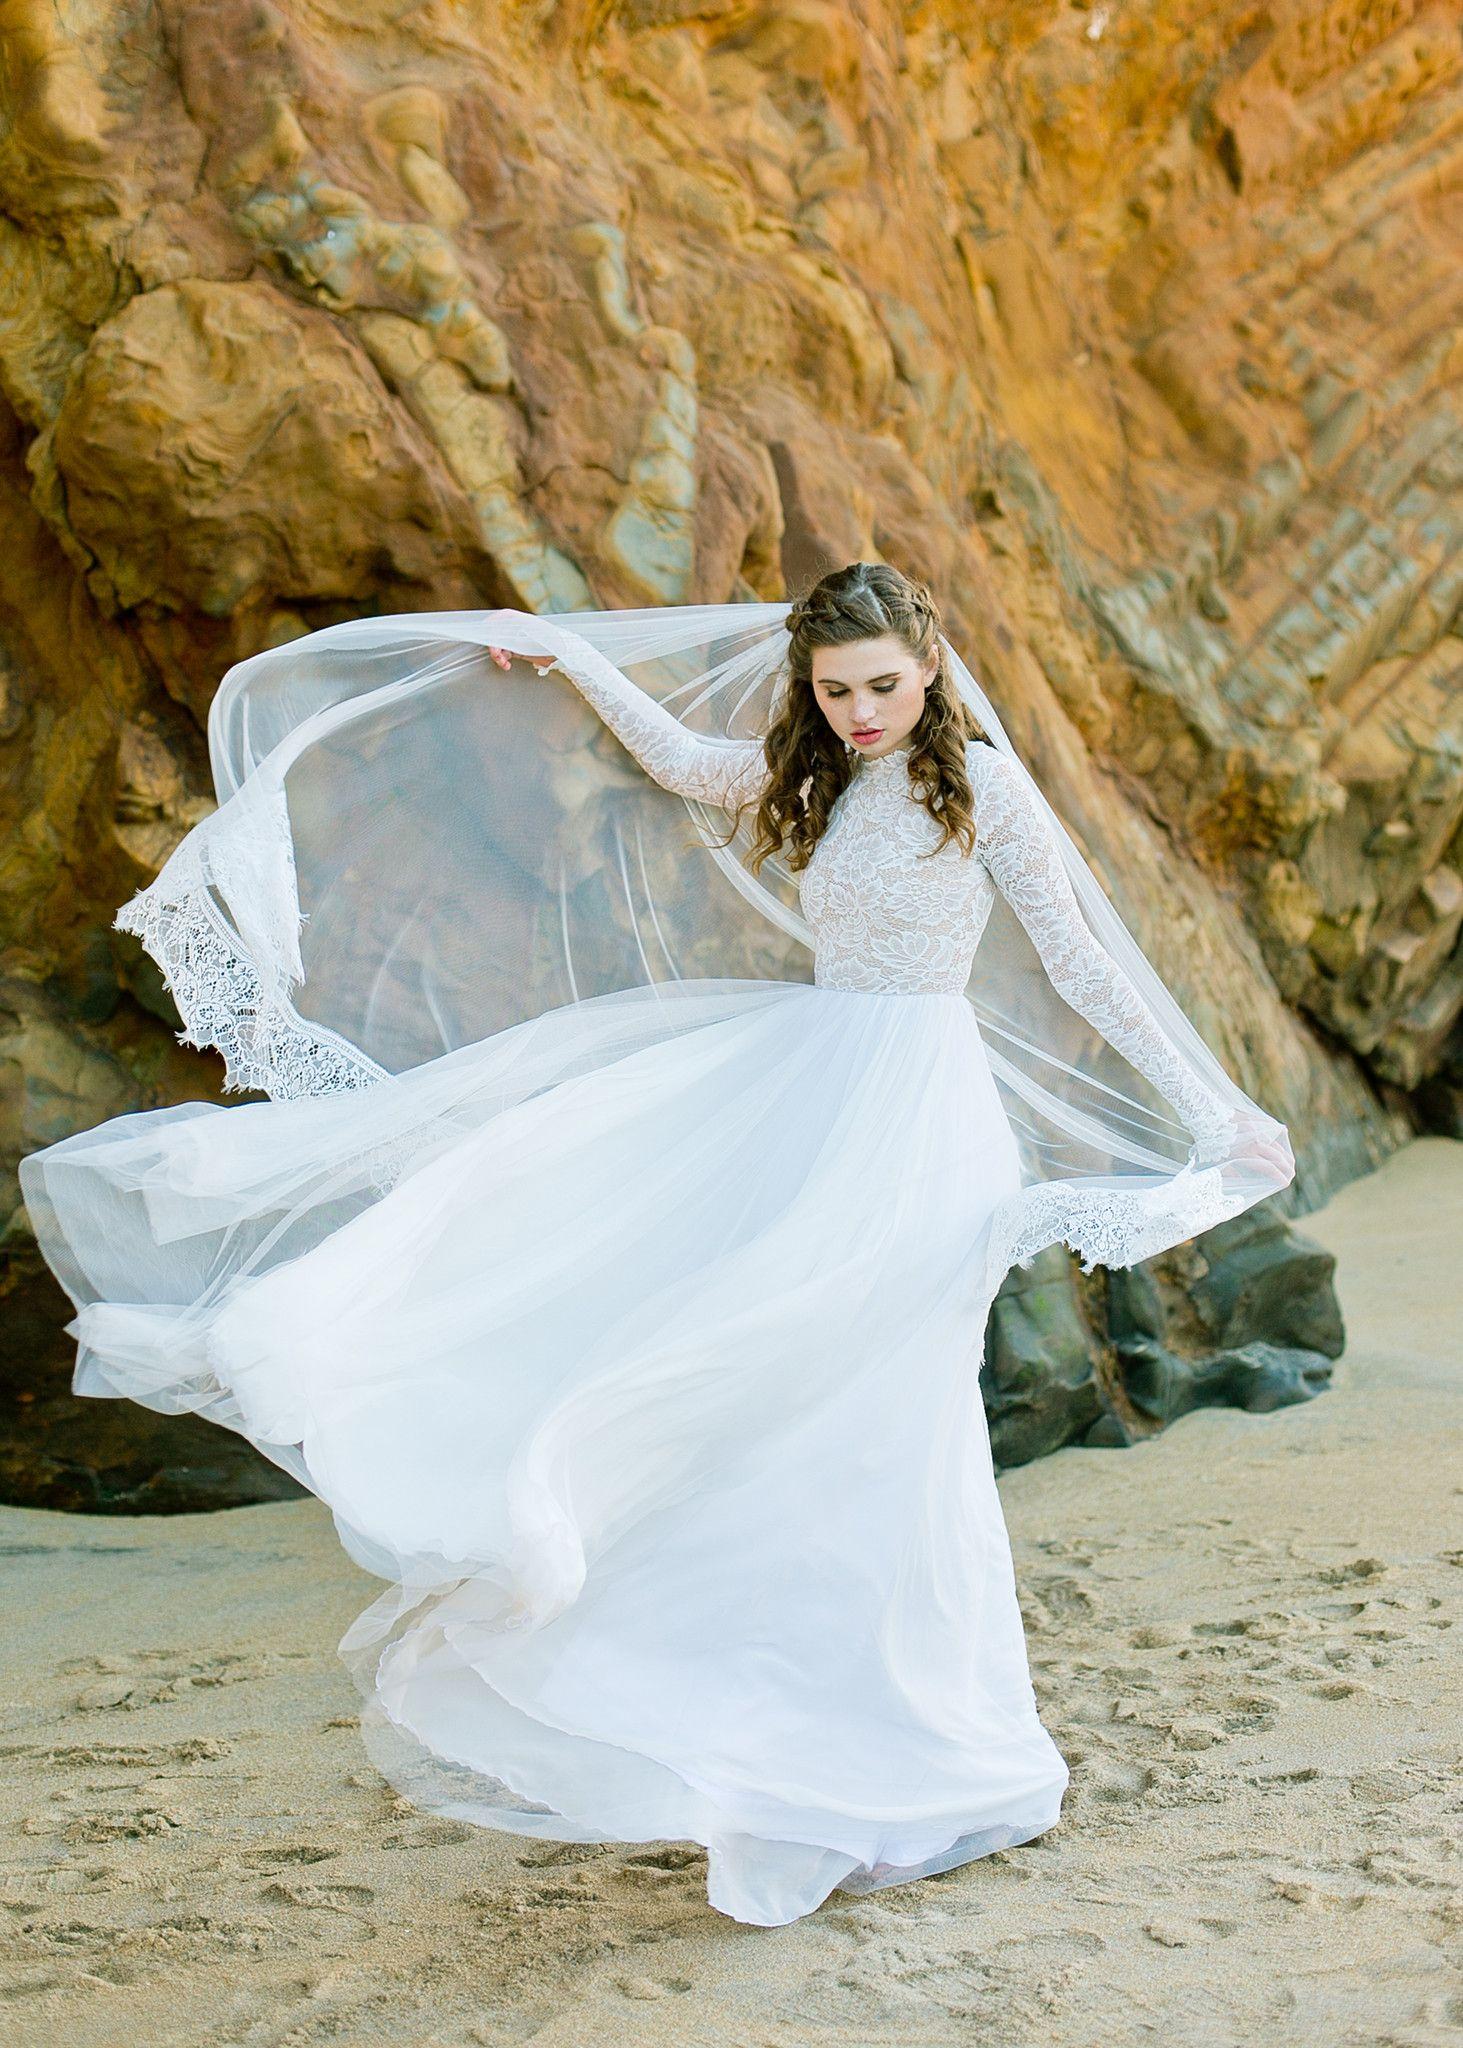 Zoey dress pinterest indie wedding dress hippy wedding